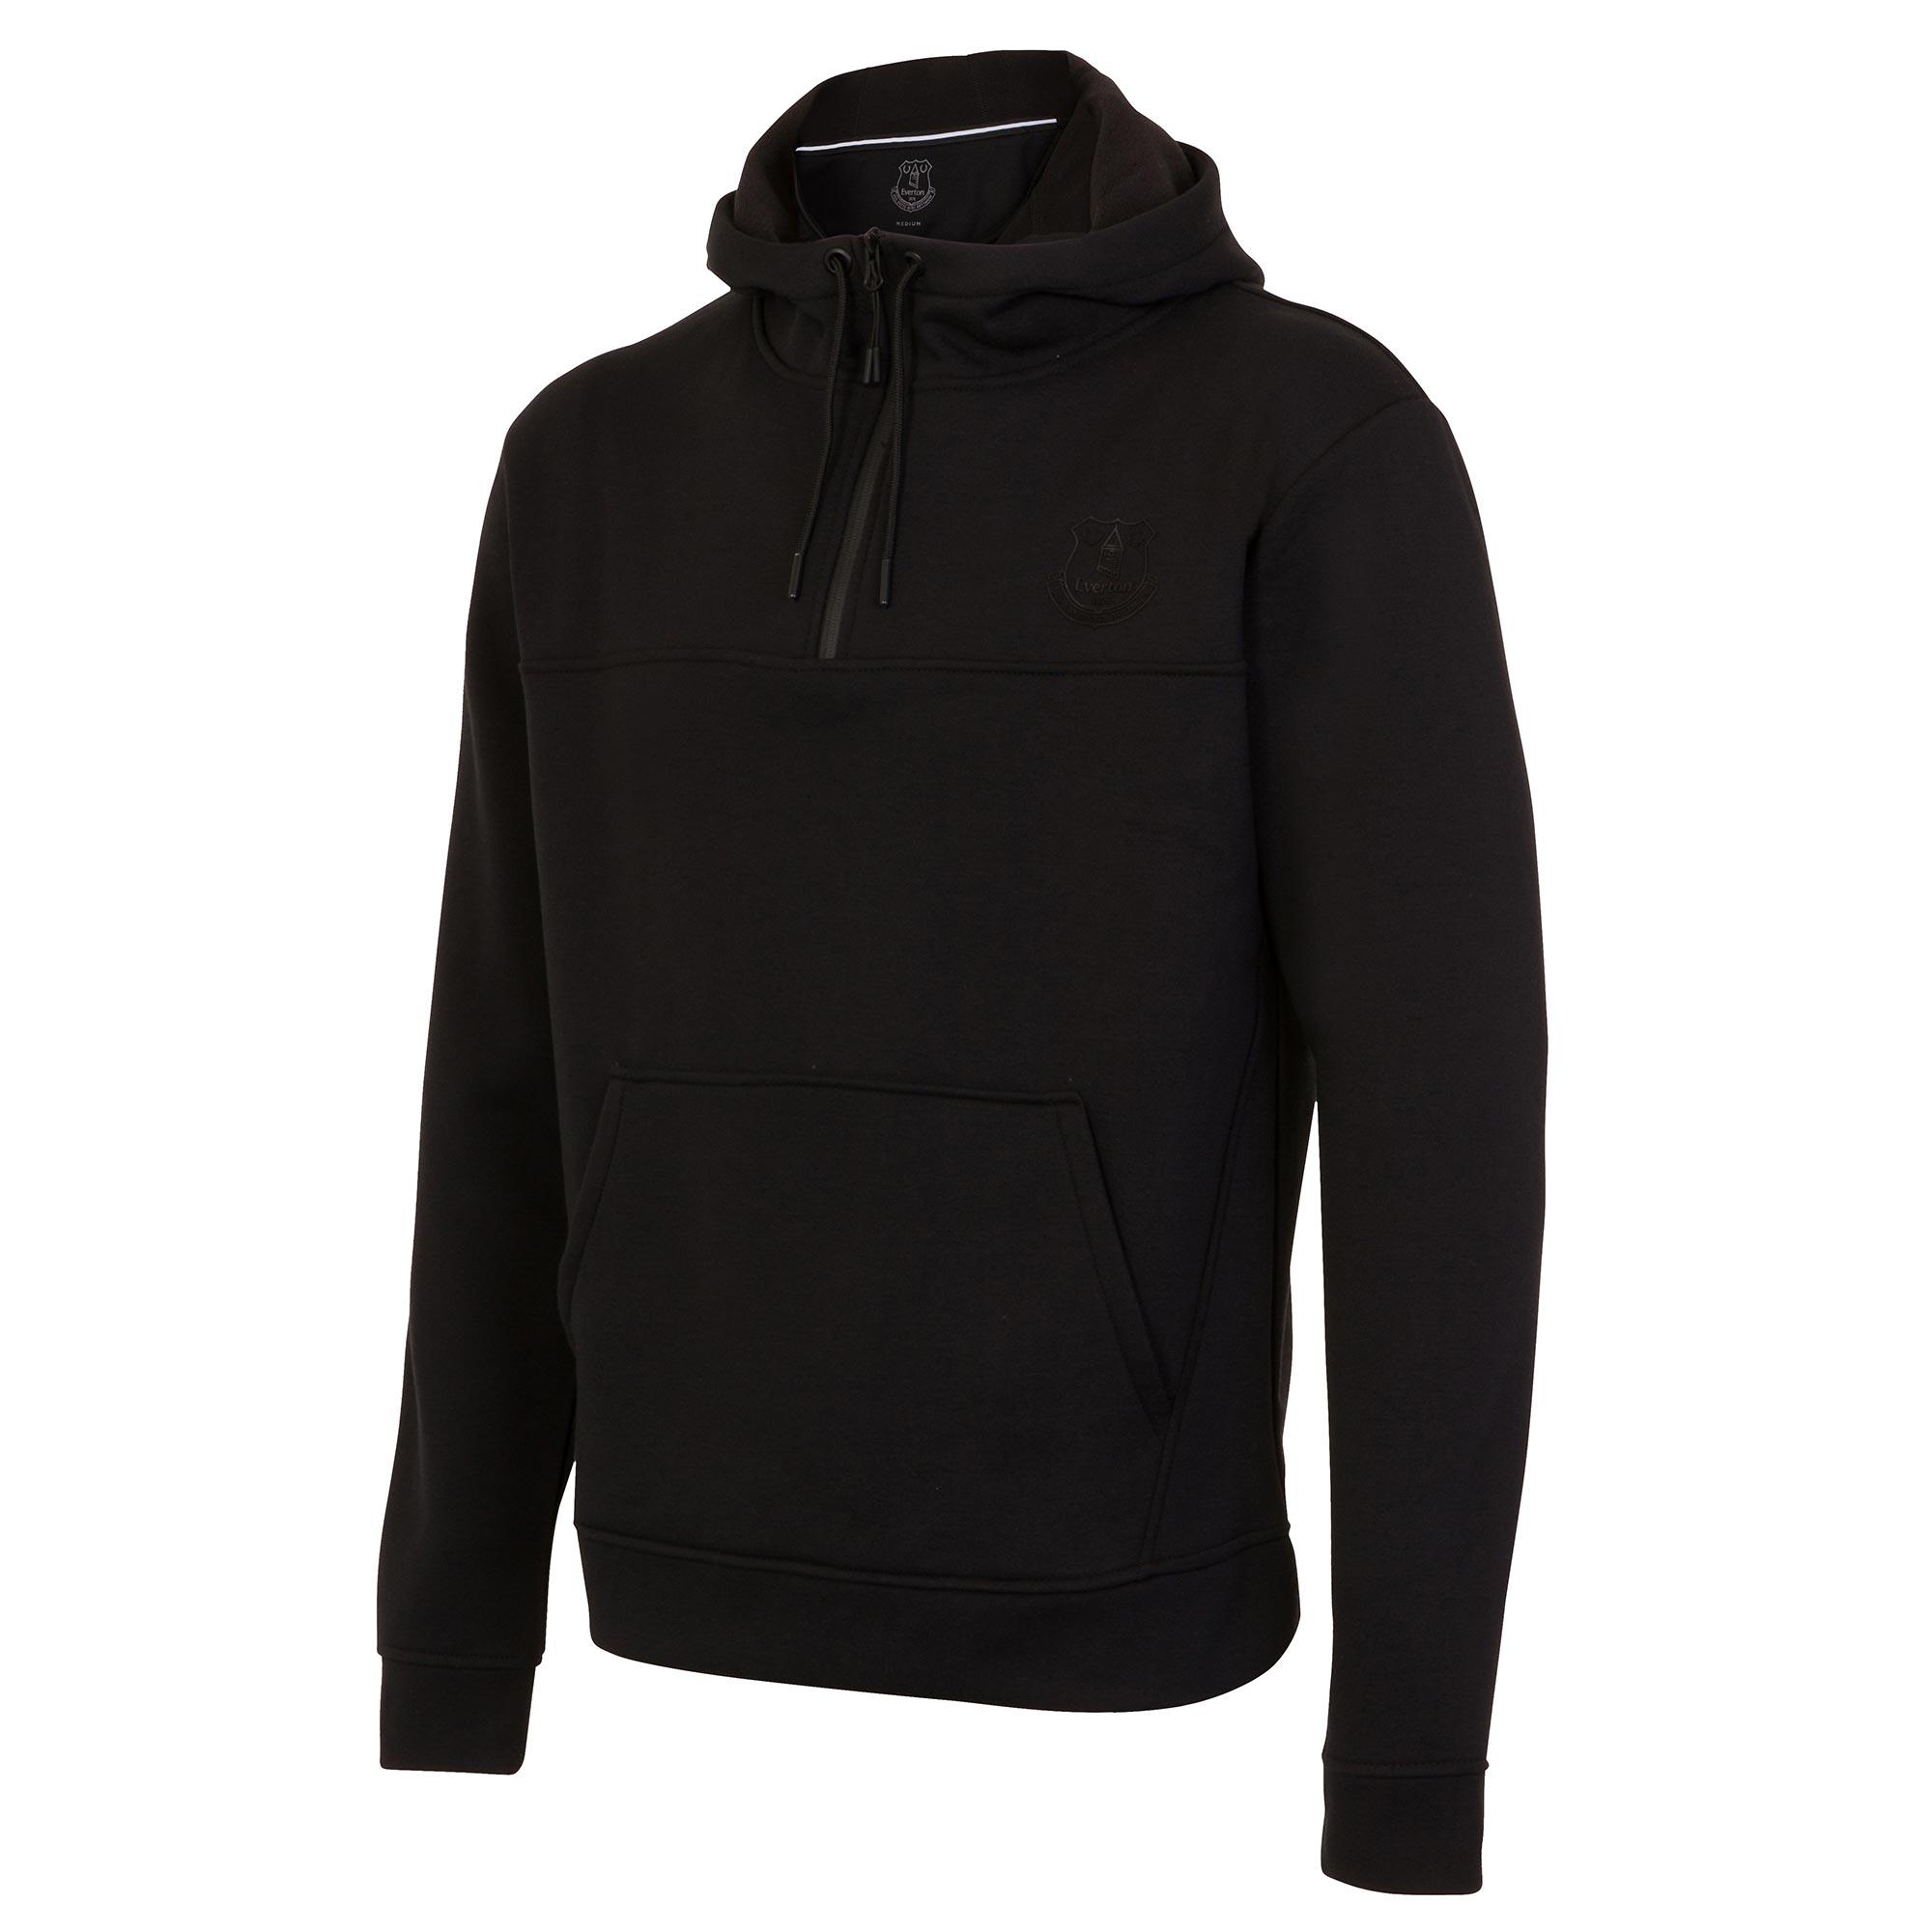 Image of Everton Ath Tech Fleece FZ Hoodie - Black